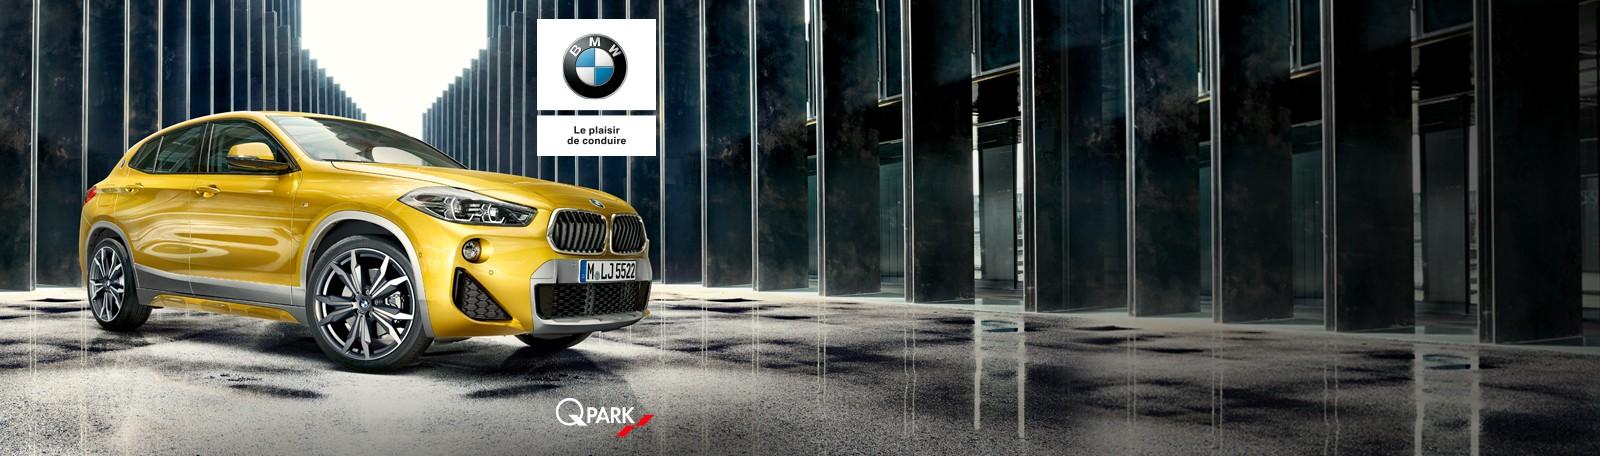 Partenariat BMW - Q-Park 2018